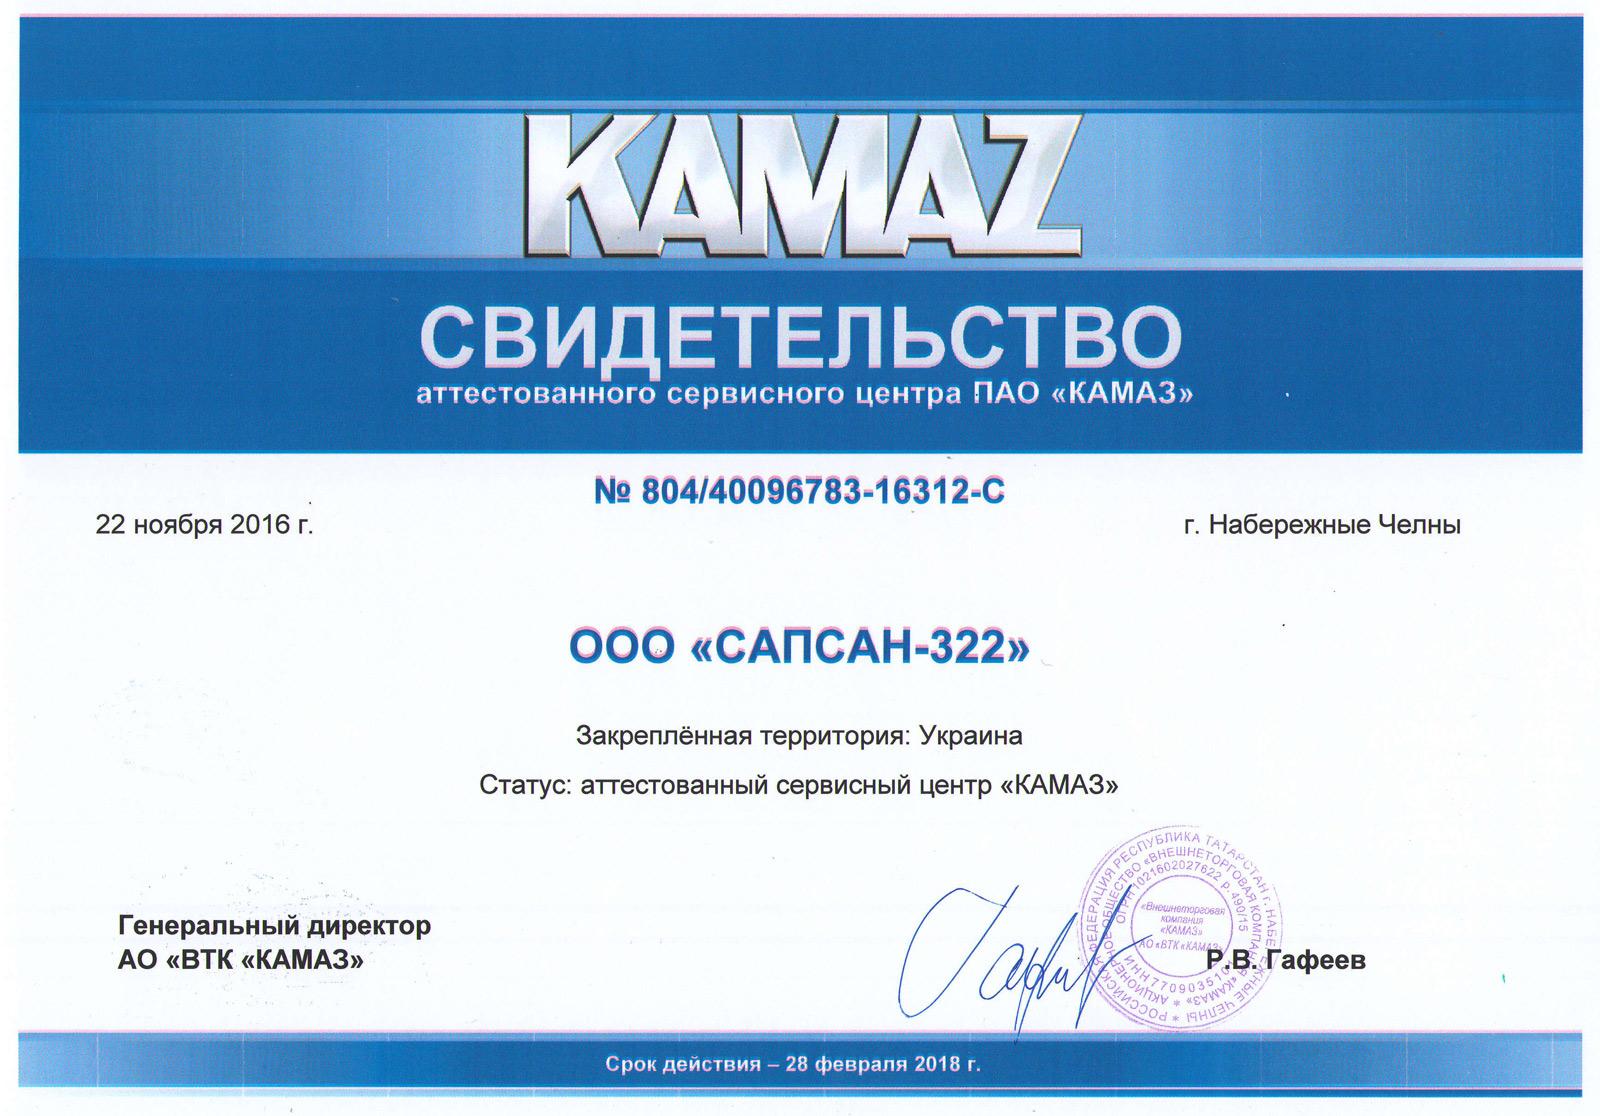 свидетельство аттестованного сервисного центра ПАО «КАМАЗ»